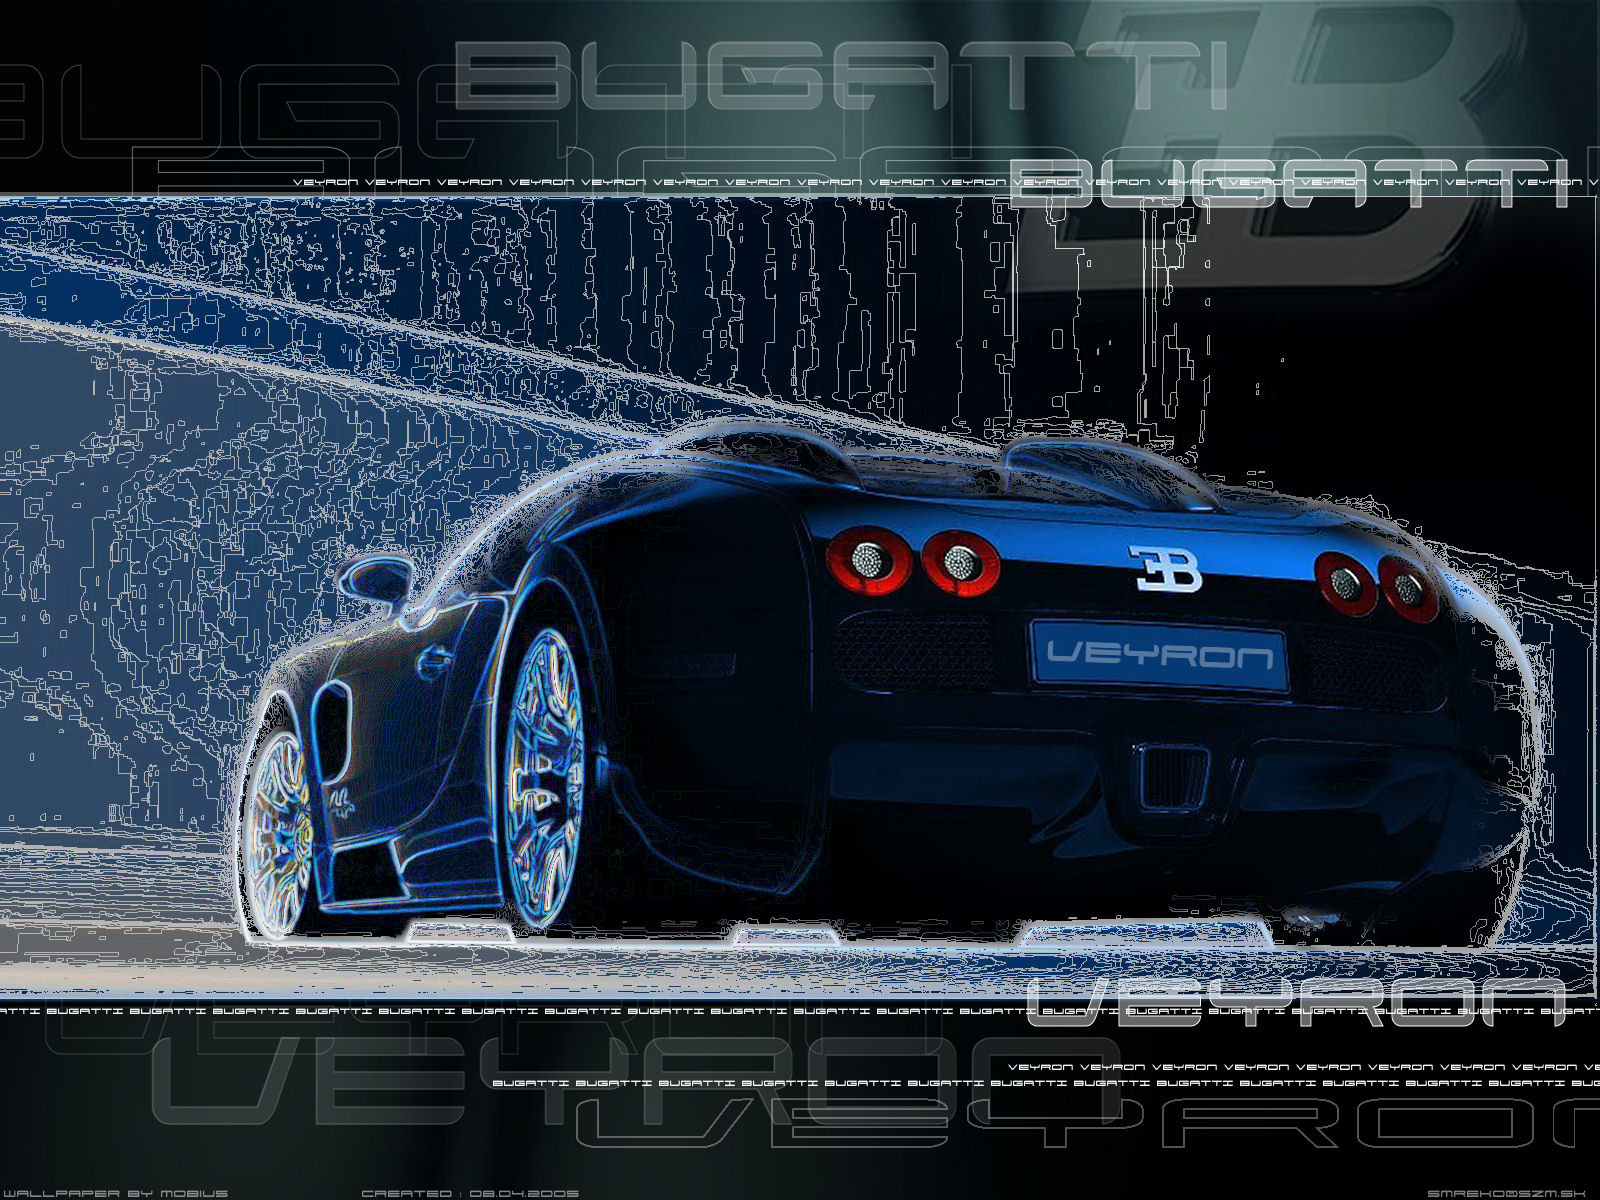 http://fc04.deviantart.net/fs16/f/2007/154/a/e/bugatti_veyron_by_smreko.jpg